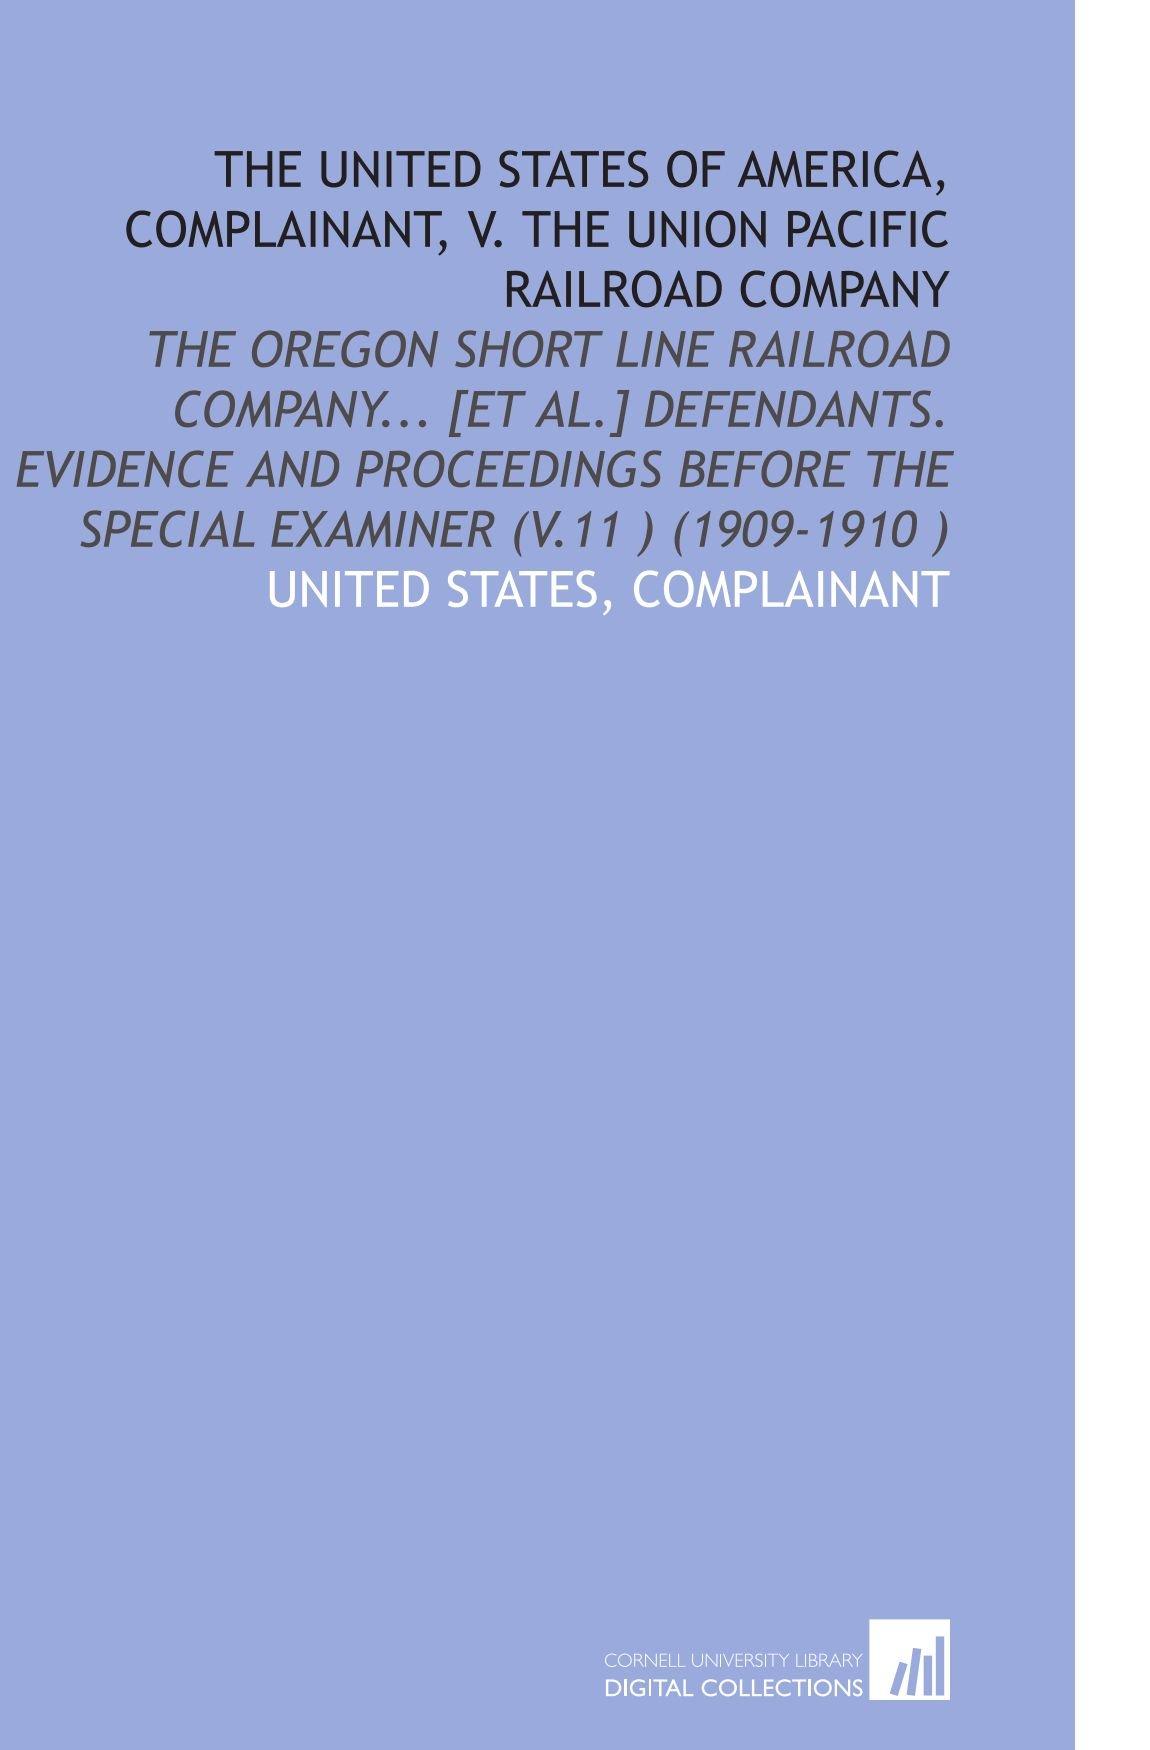 Read Online The United States of America, Complainant, V. The Union Pacific Railroad Company: The Oregon Short Line Railroad Company... [Et Al.] Defendants. ... the Special Examiner (V.11 ) (1909-1910 ) PDF